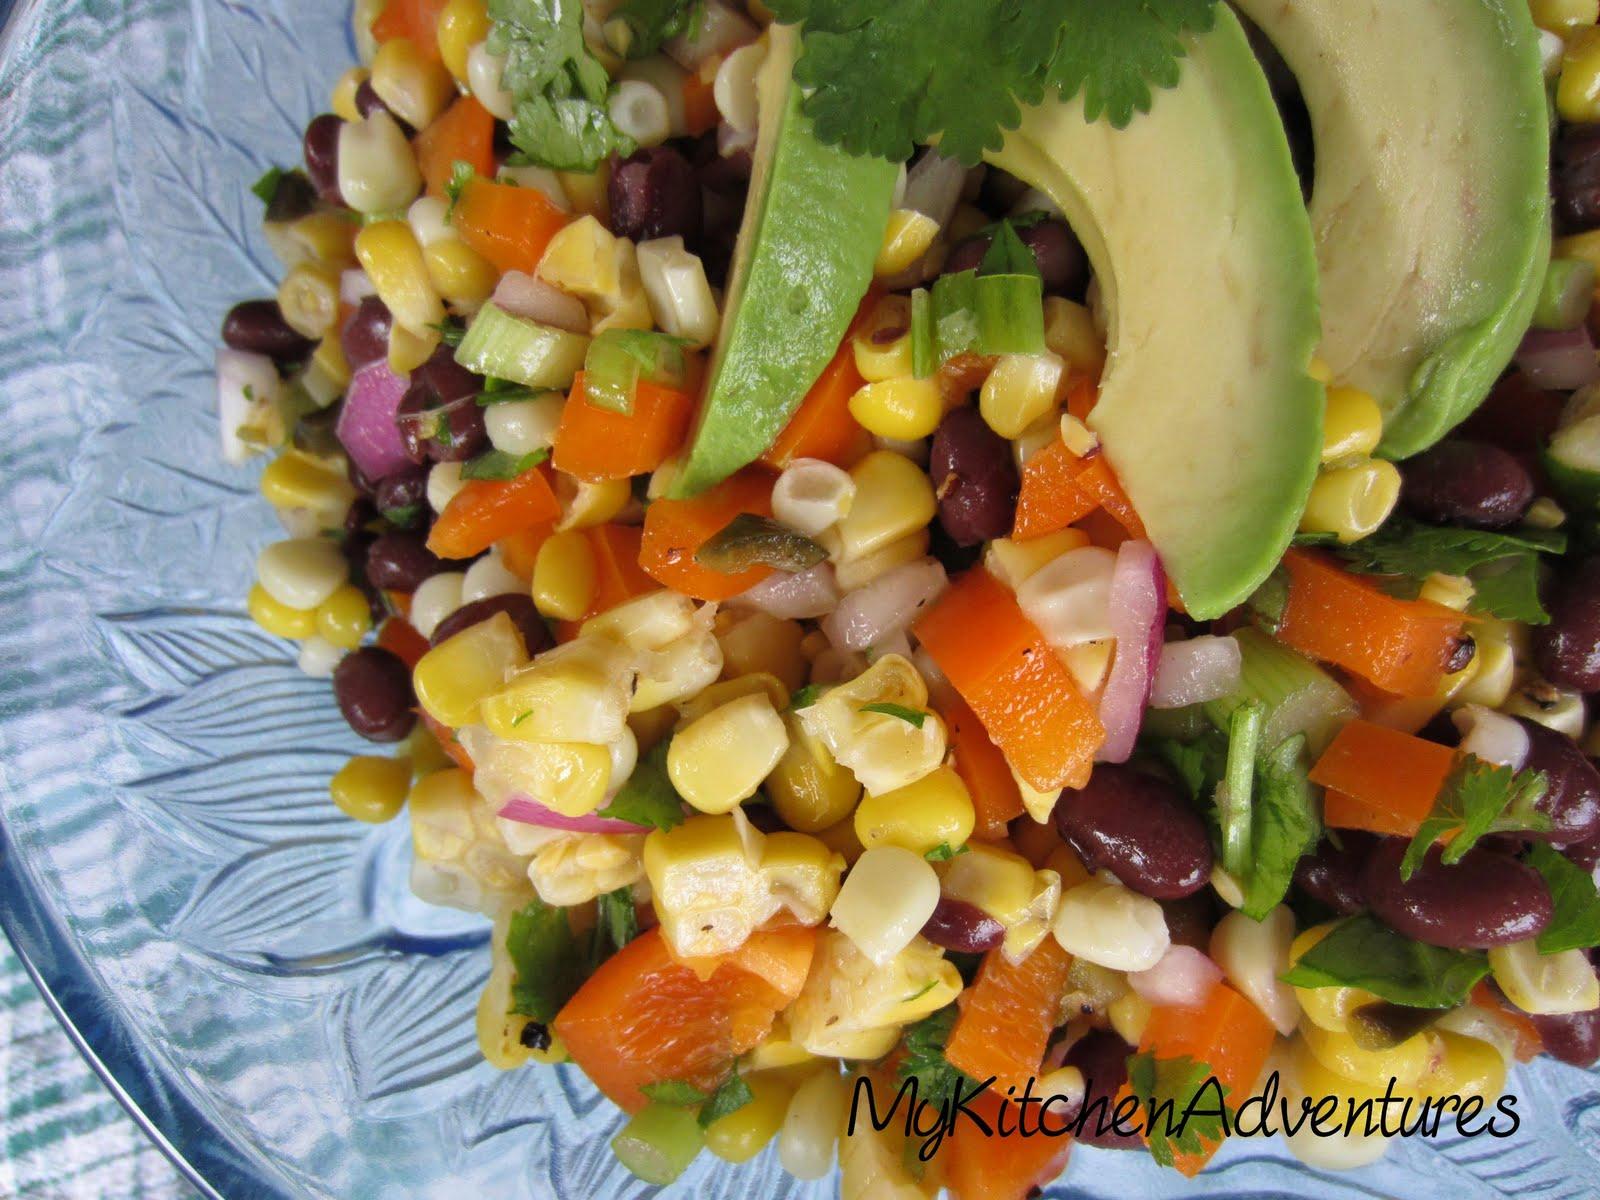 Renee's Kitchen Adventures: Corn, Black Bean and Avocado Salad